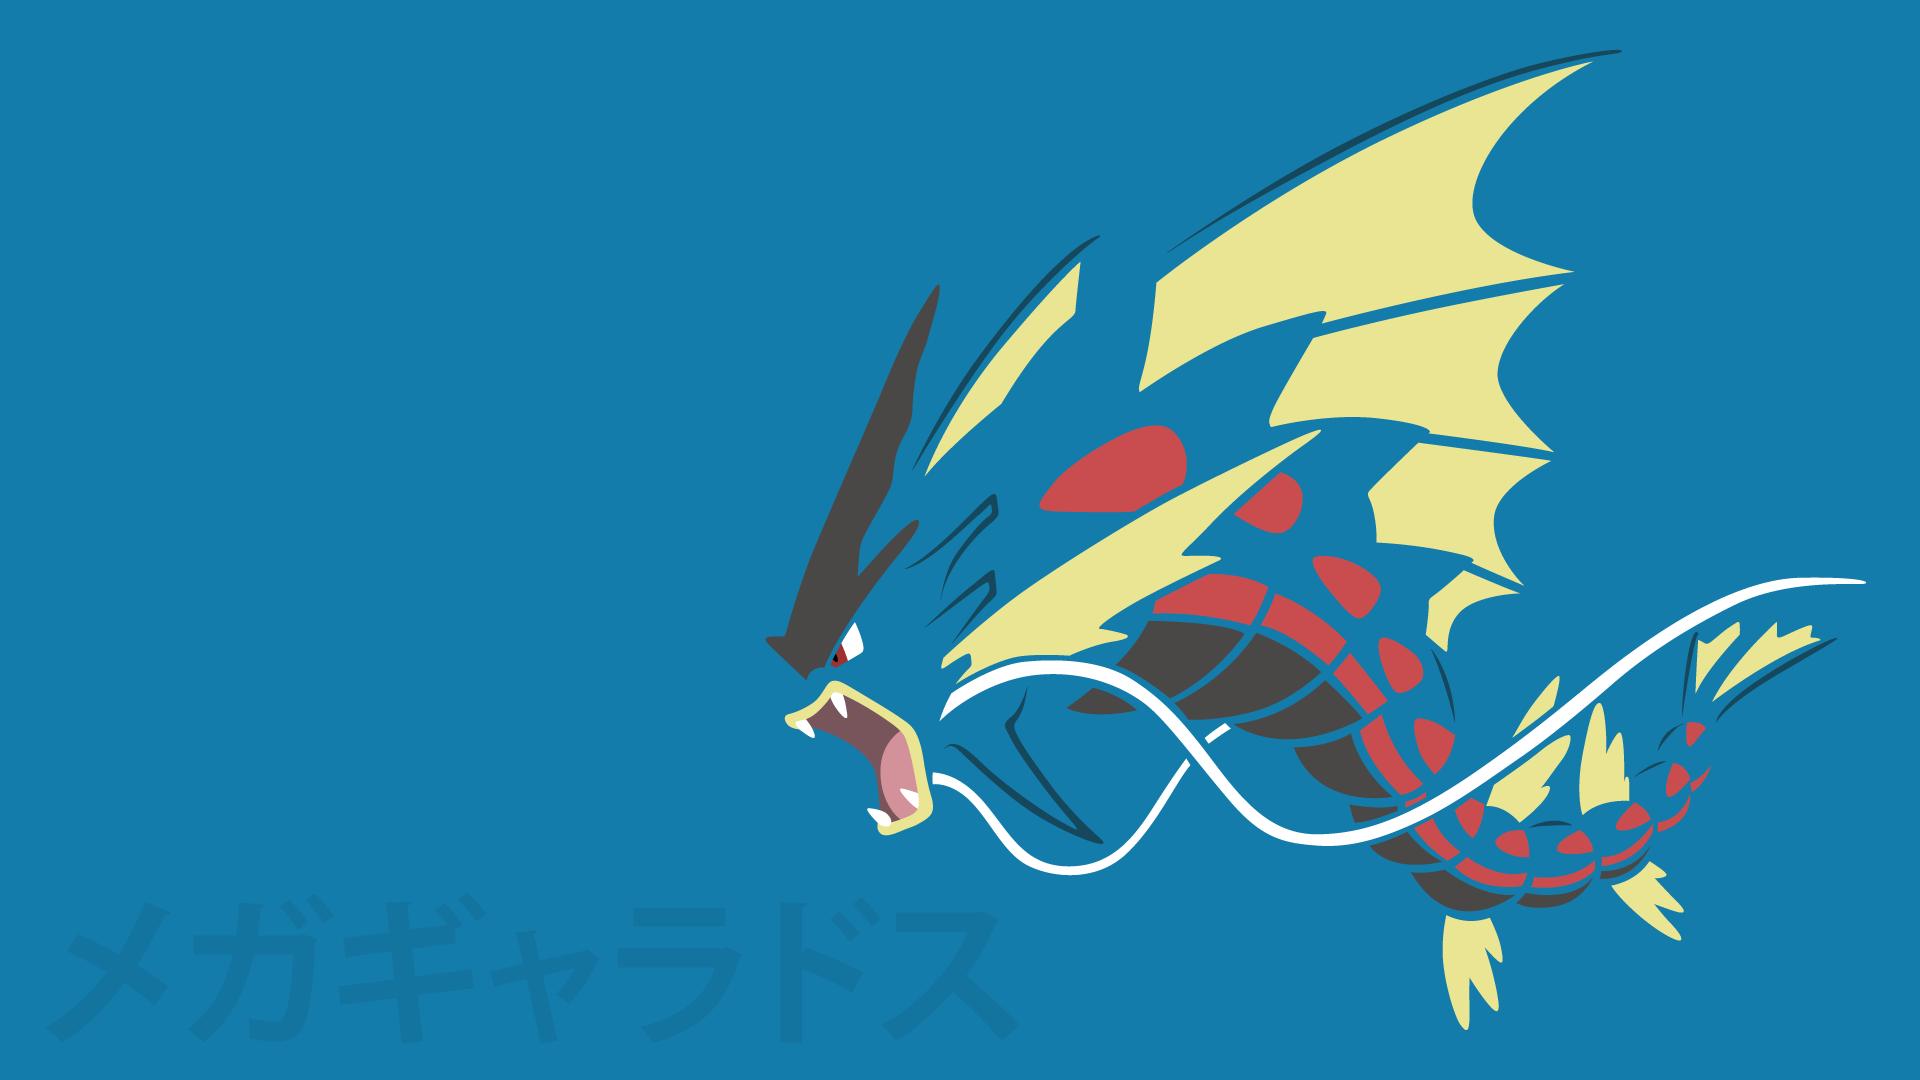 Pokemon Gyarados Mega Evolution Card Images   Pokemon Images